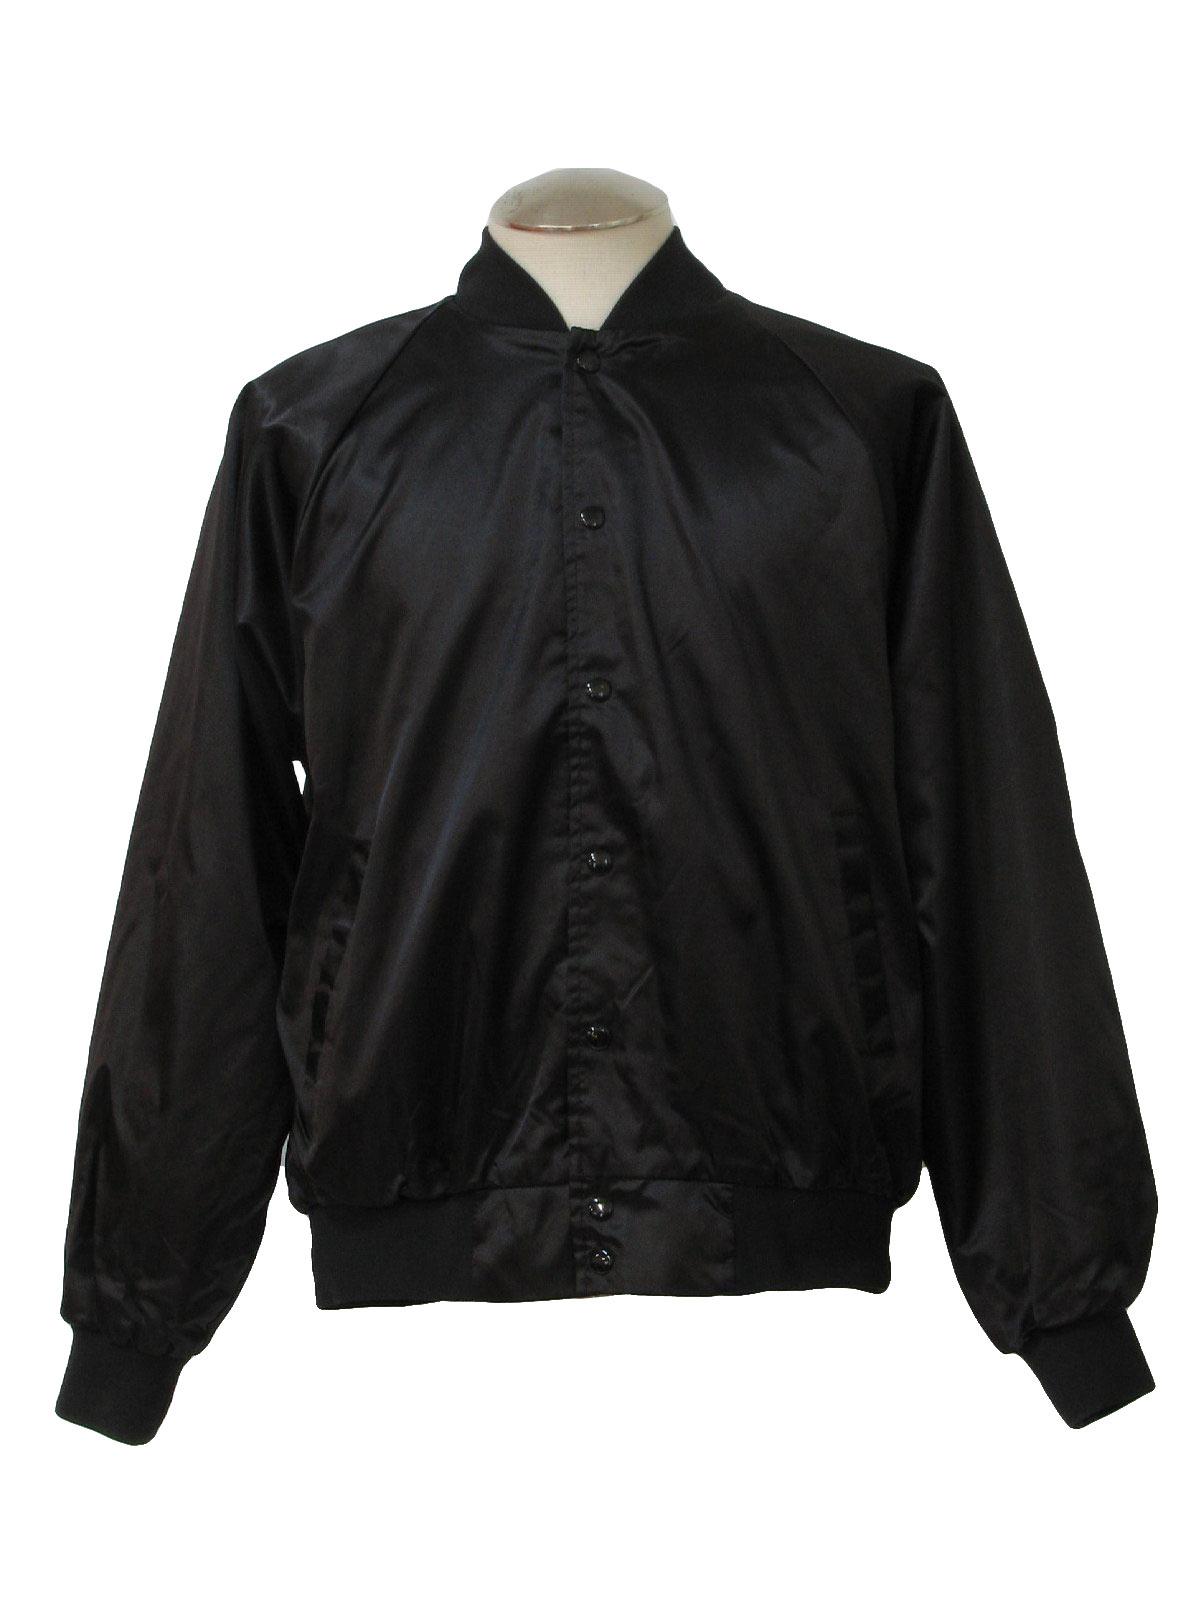 Retro Eighties Jacket: 80s -Augusta- Mens black-plum nylon satin